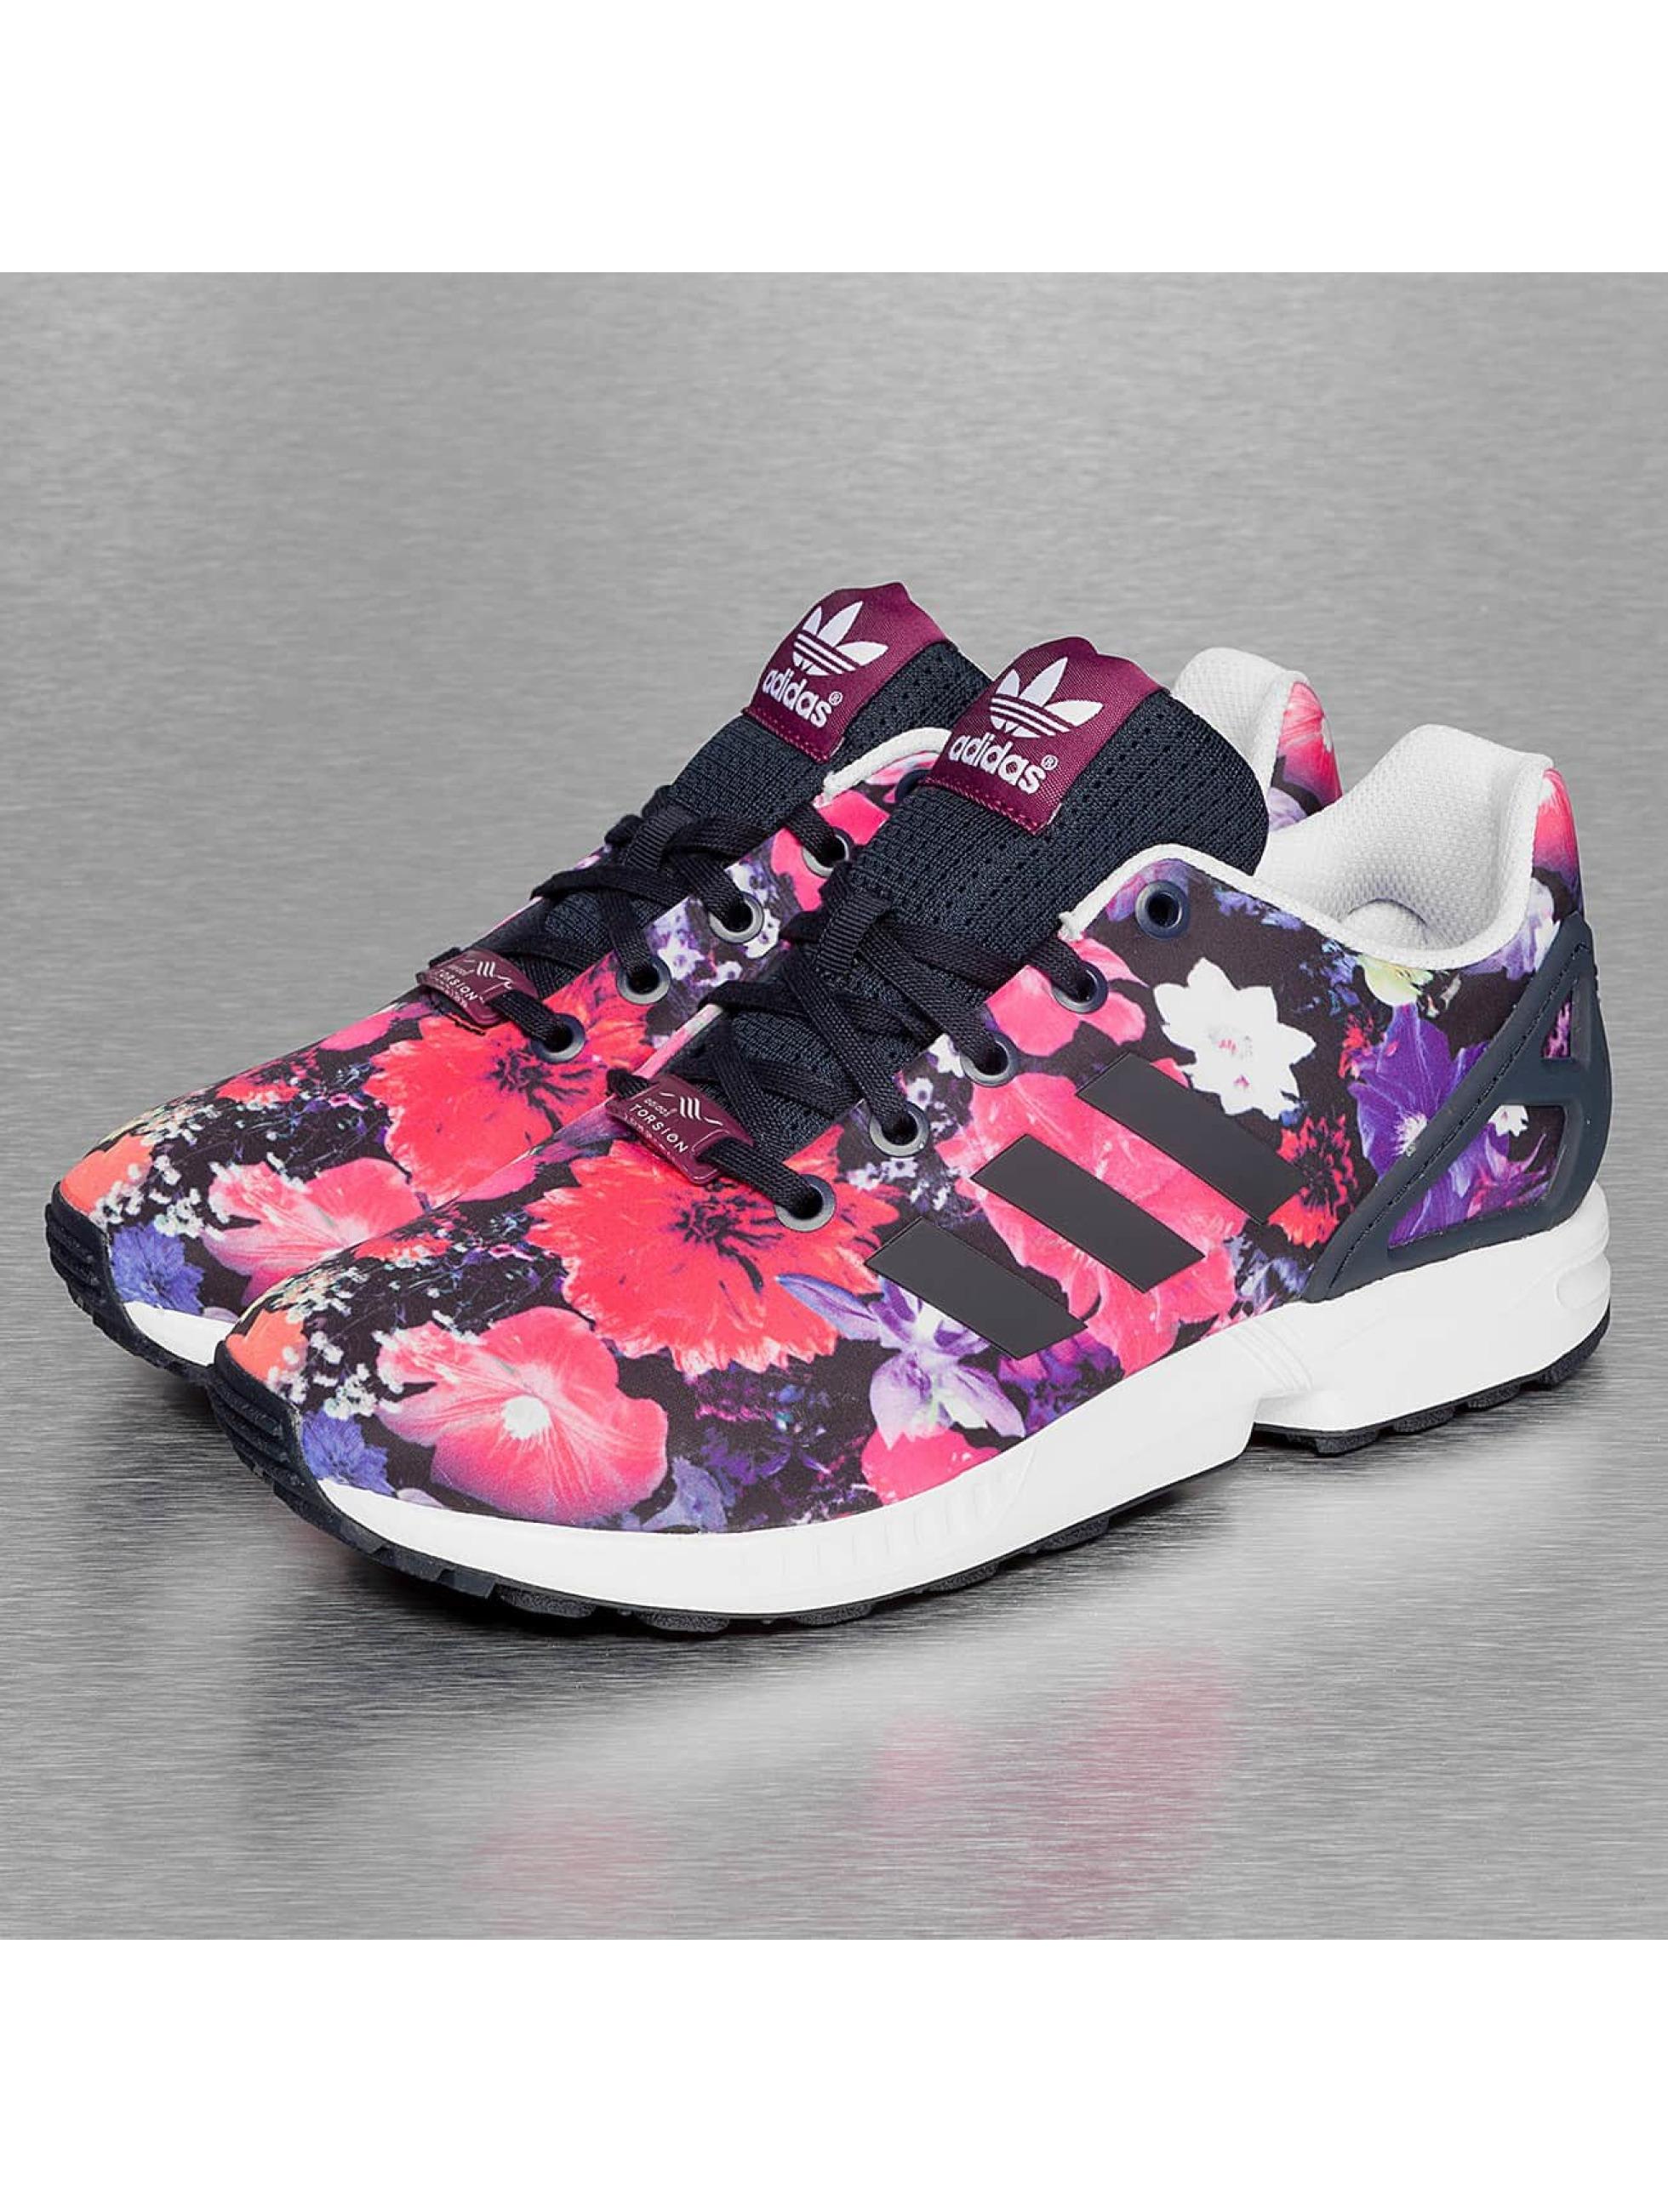 Adidas Turnschuhe Damen Bunt